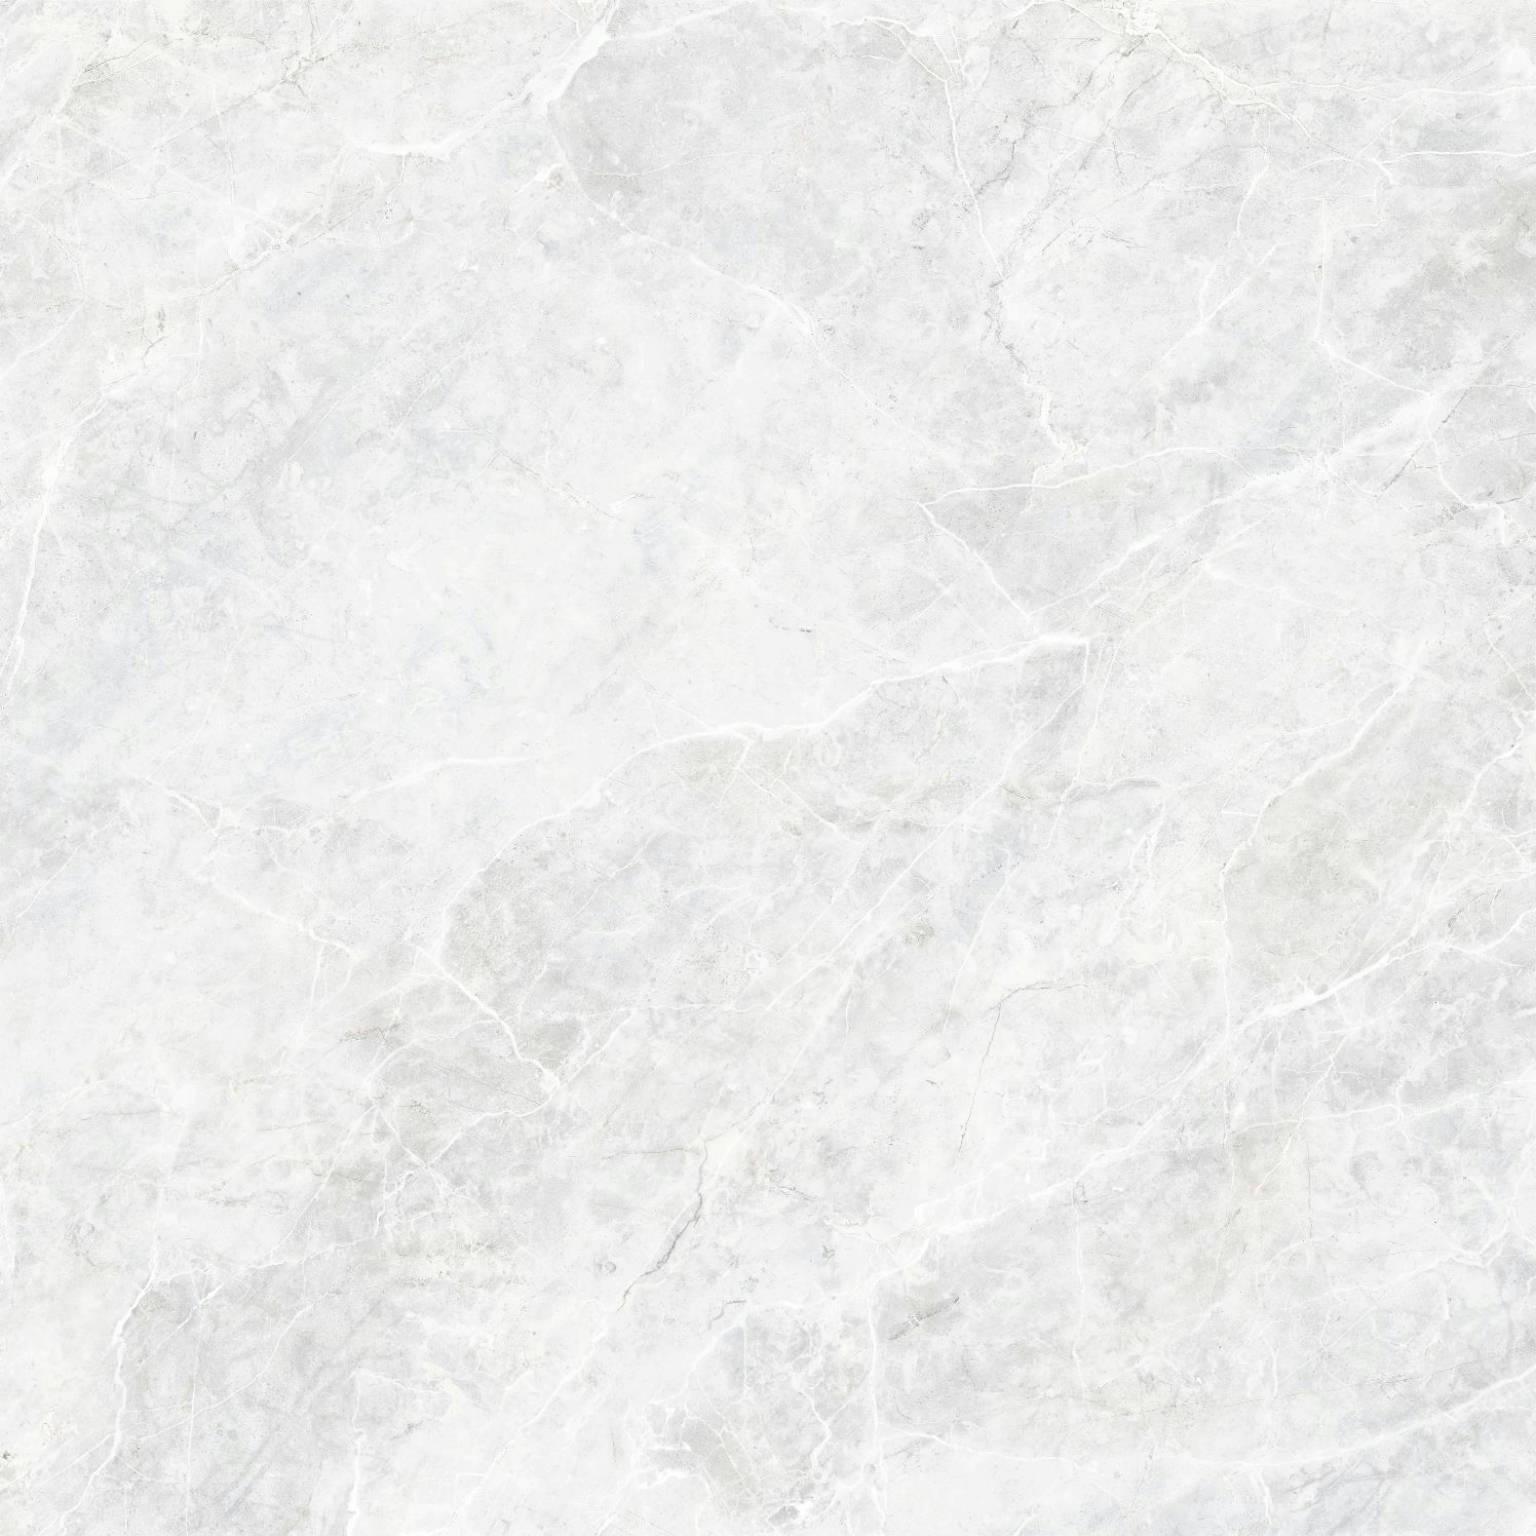 MORVEDRE BLANCO PULIDO | Porcemall